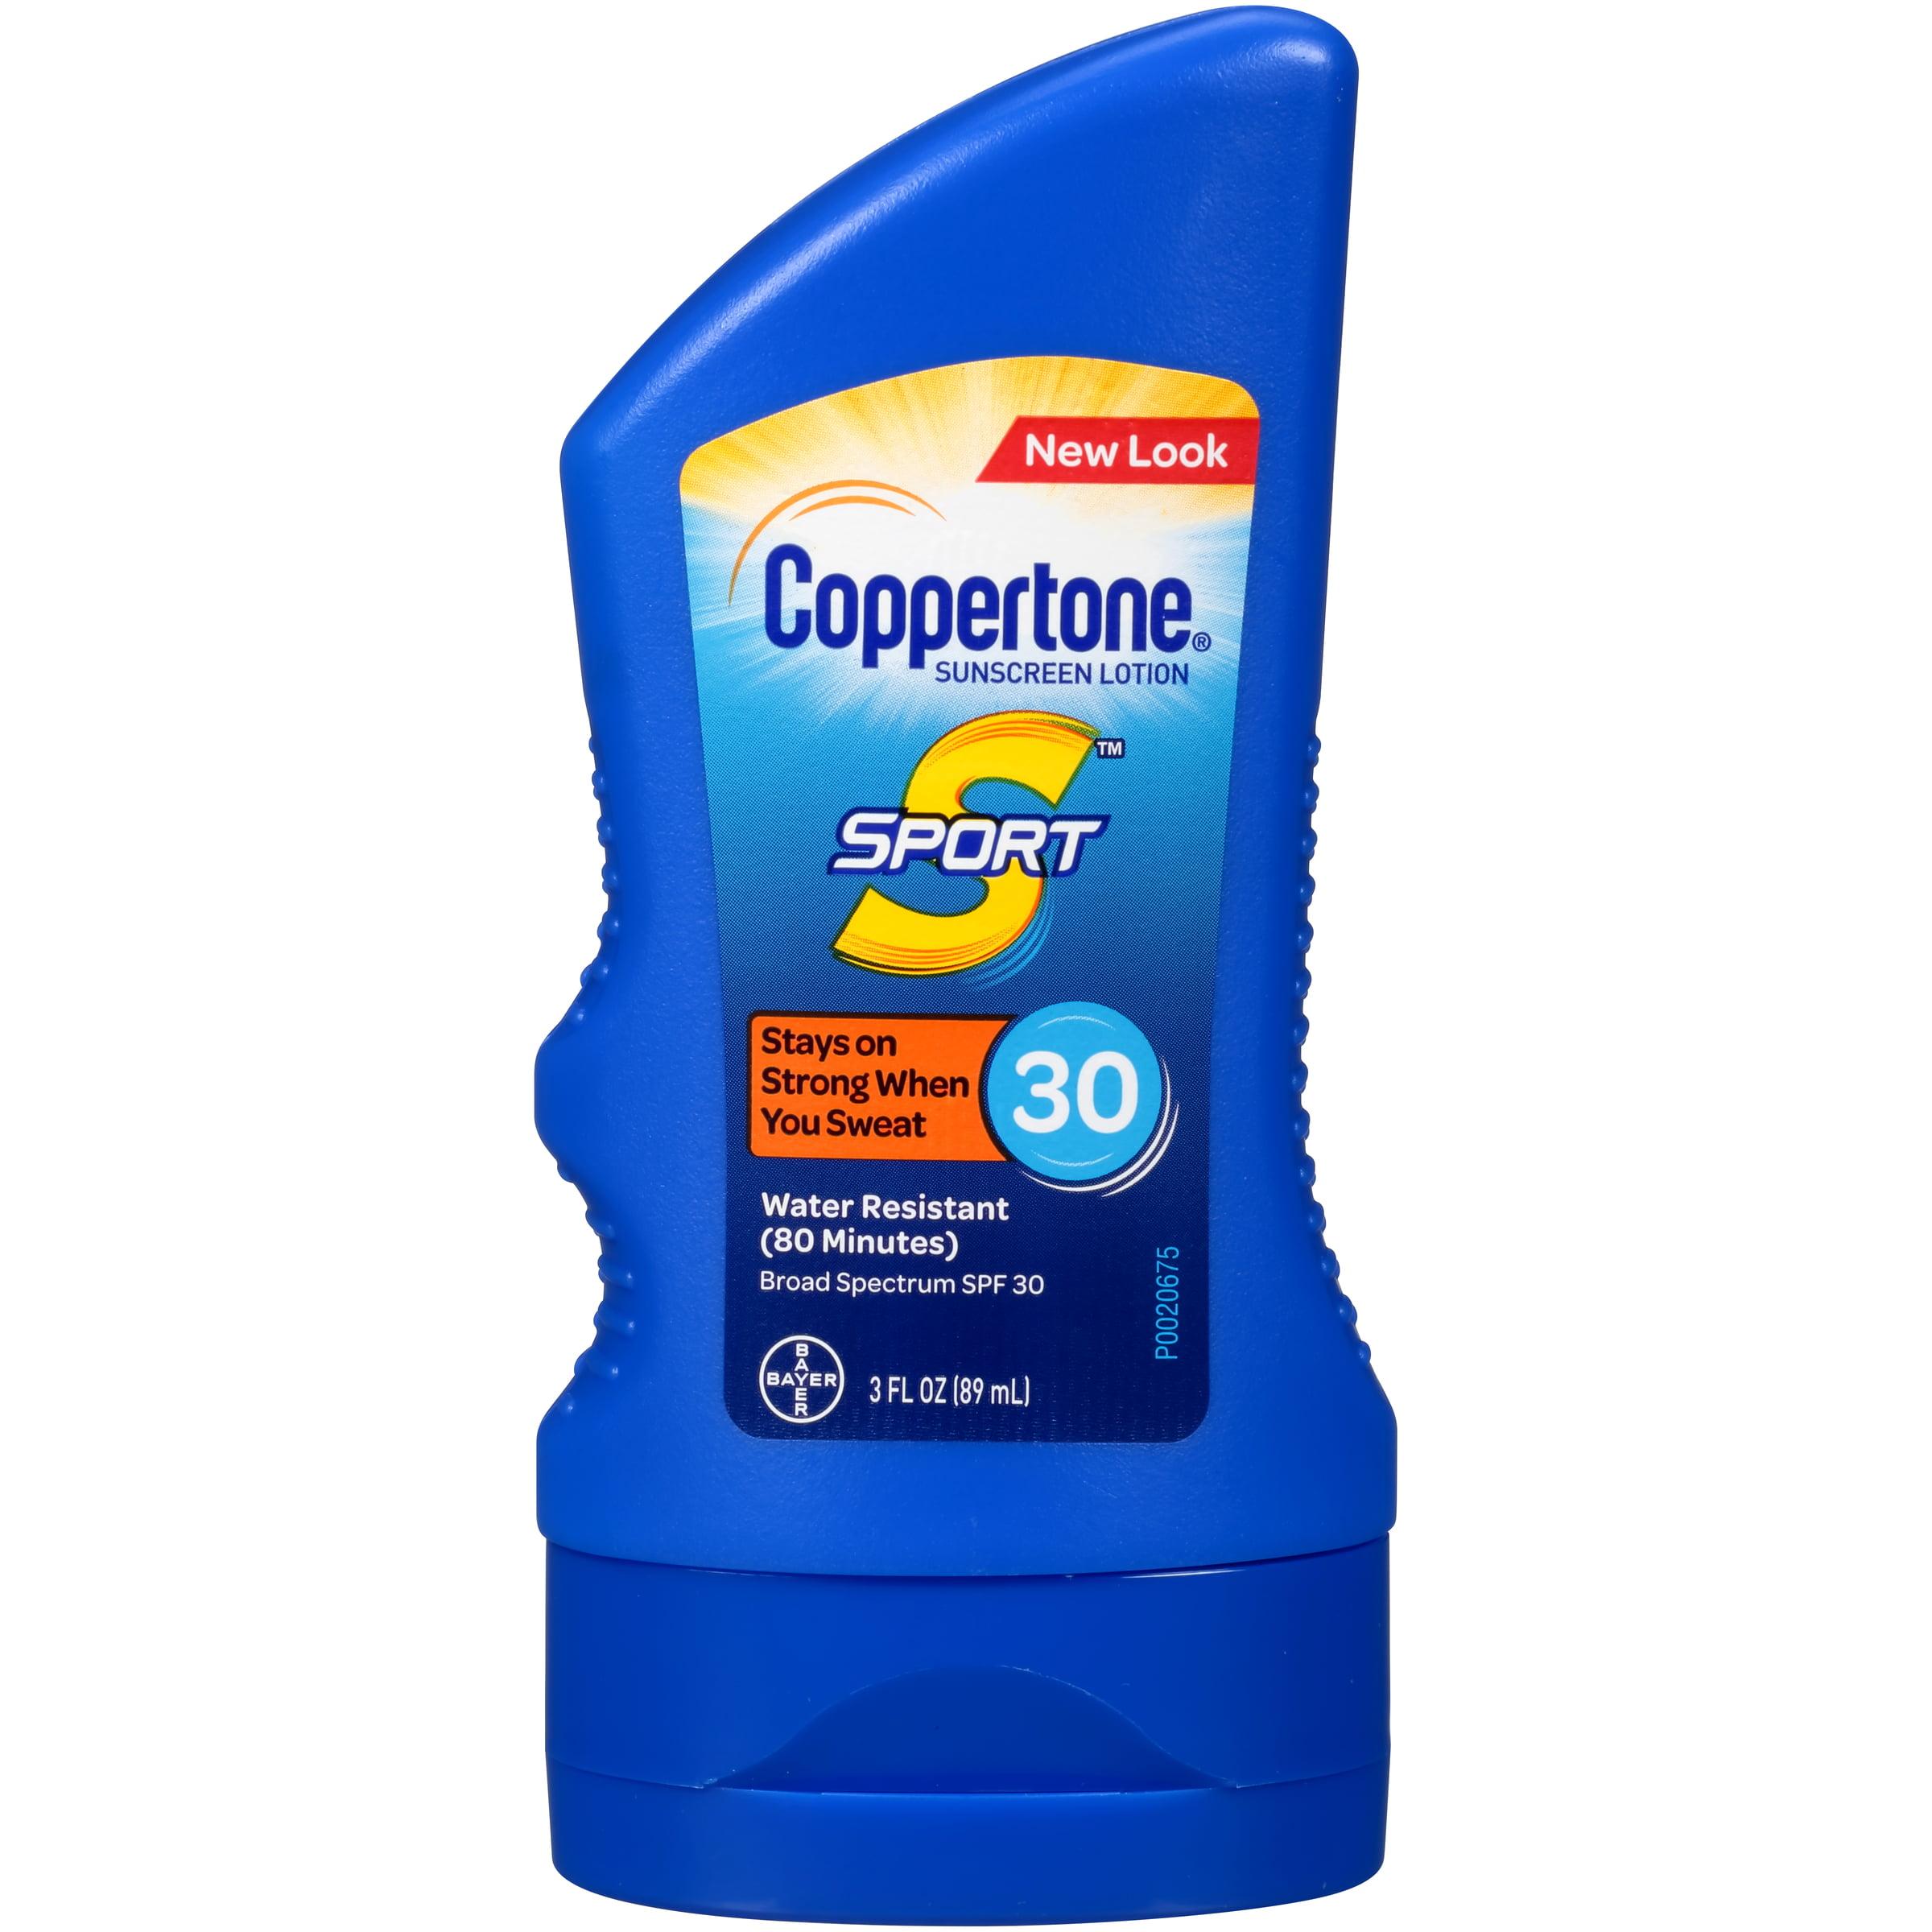 Coppertone Sport Sunscreen Lotion SPF 30, 3 fl oz Travel Size